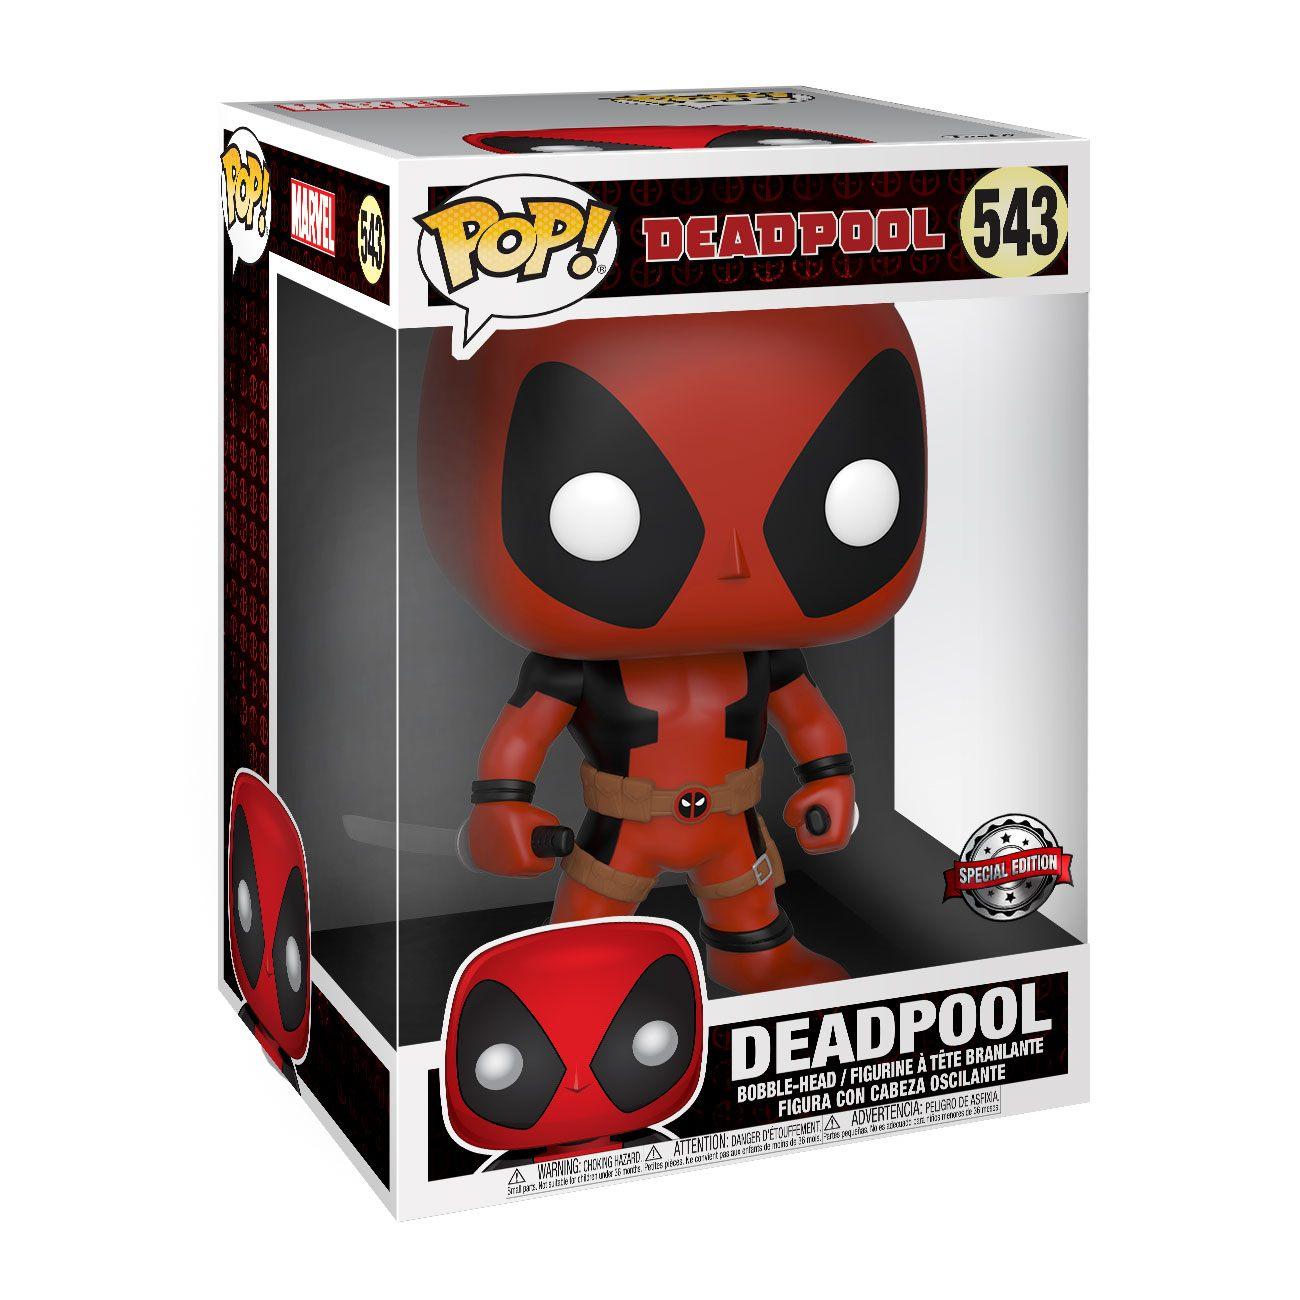 Deadpool Super Sized POP! Vinyl Figure Two Sword Red Deadpool 25 cm